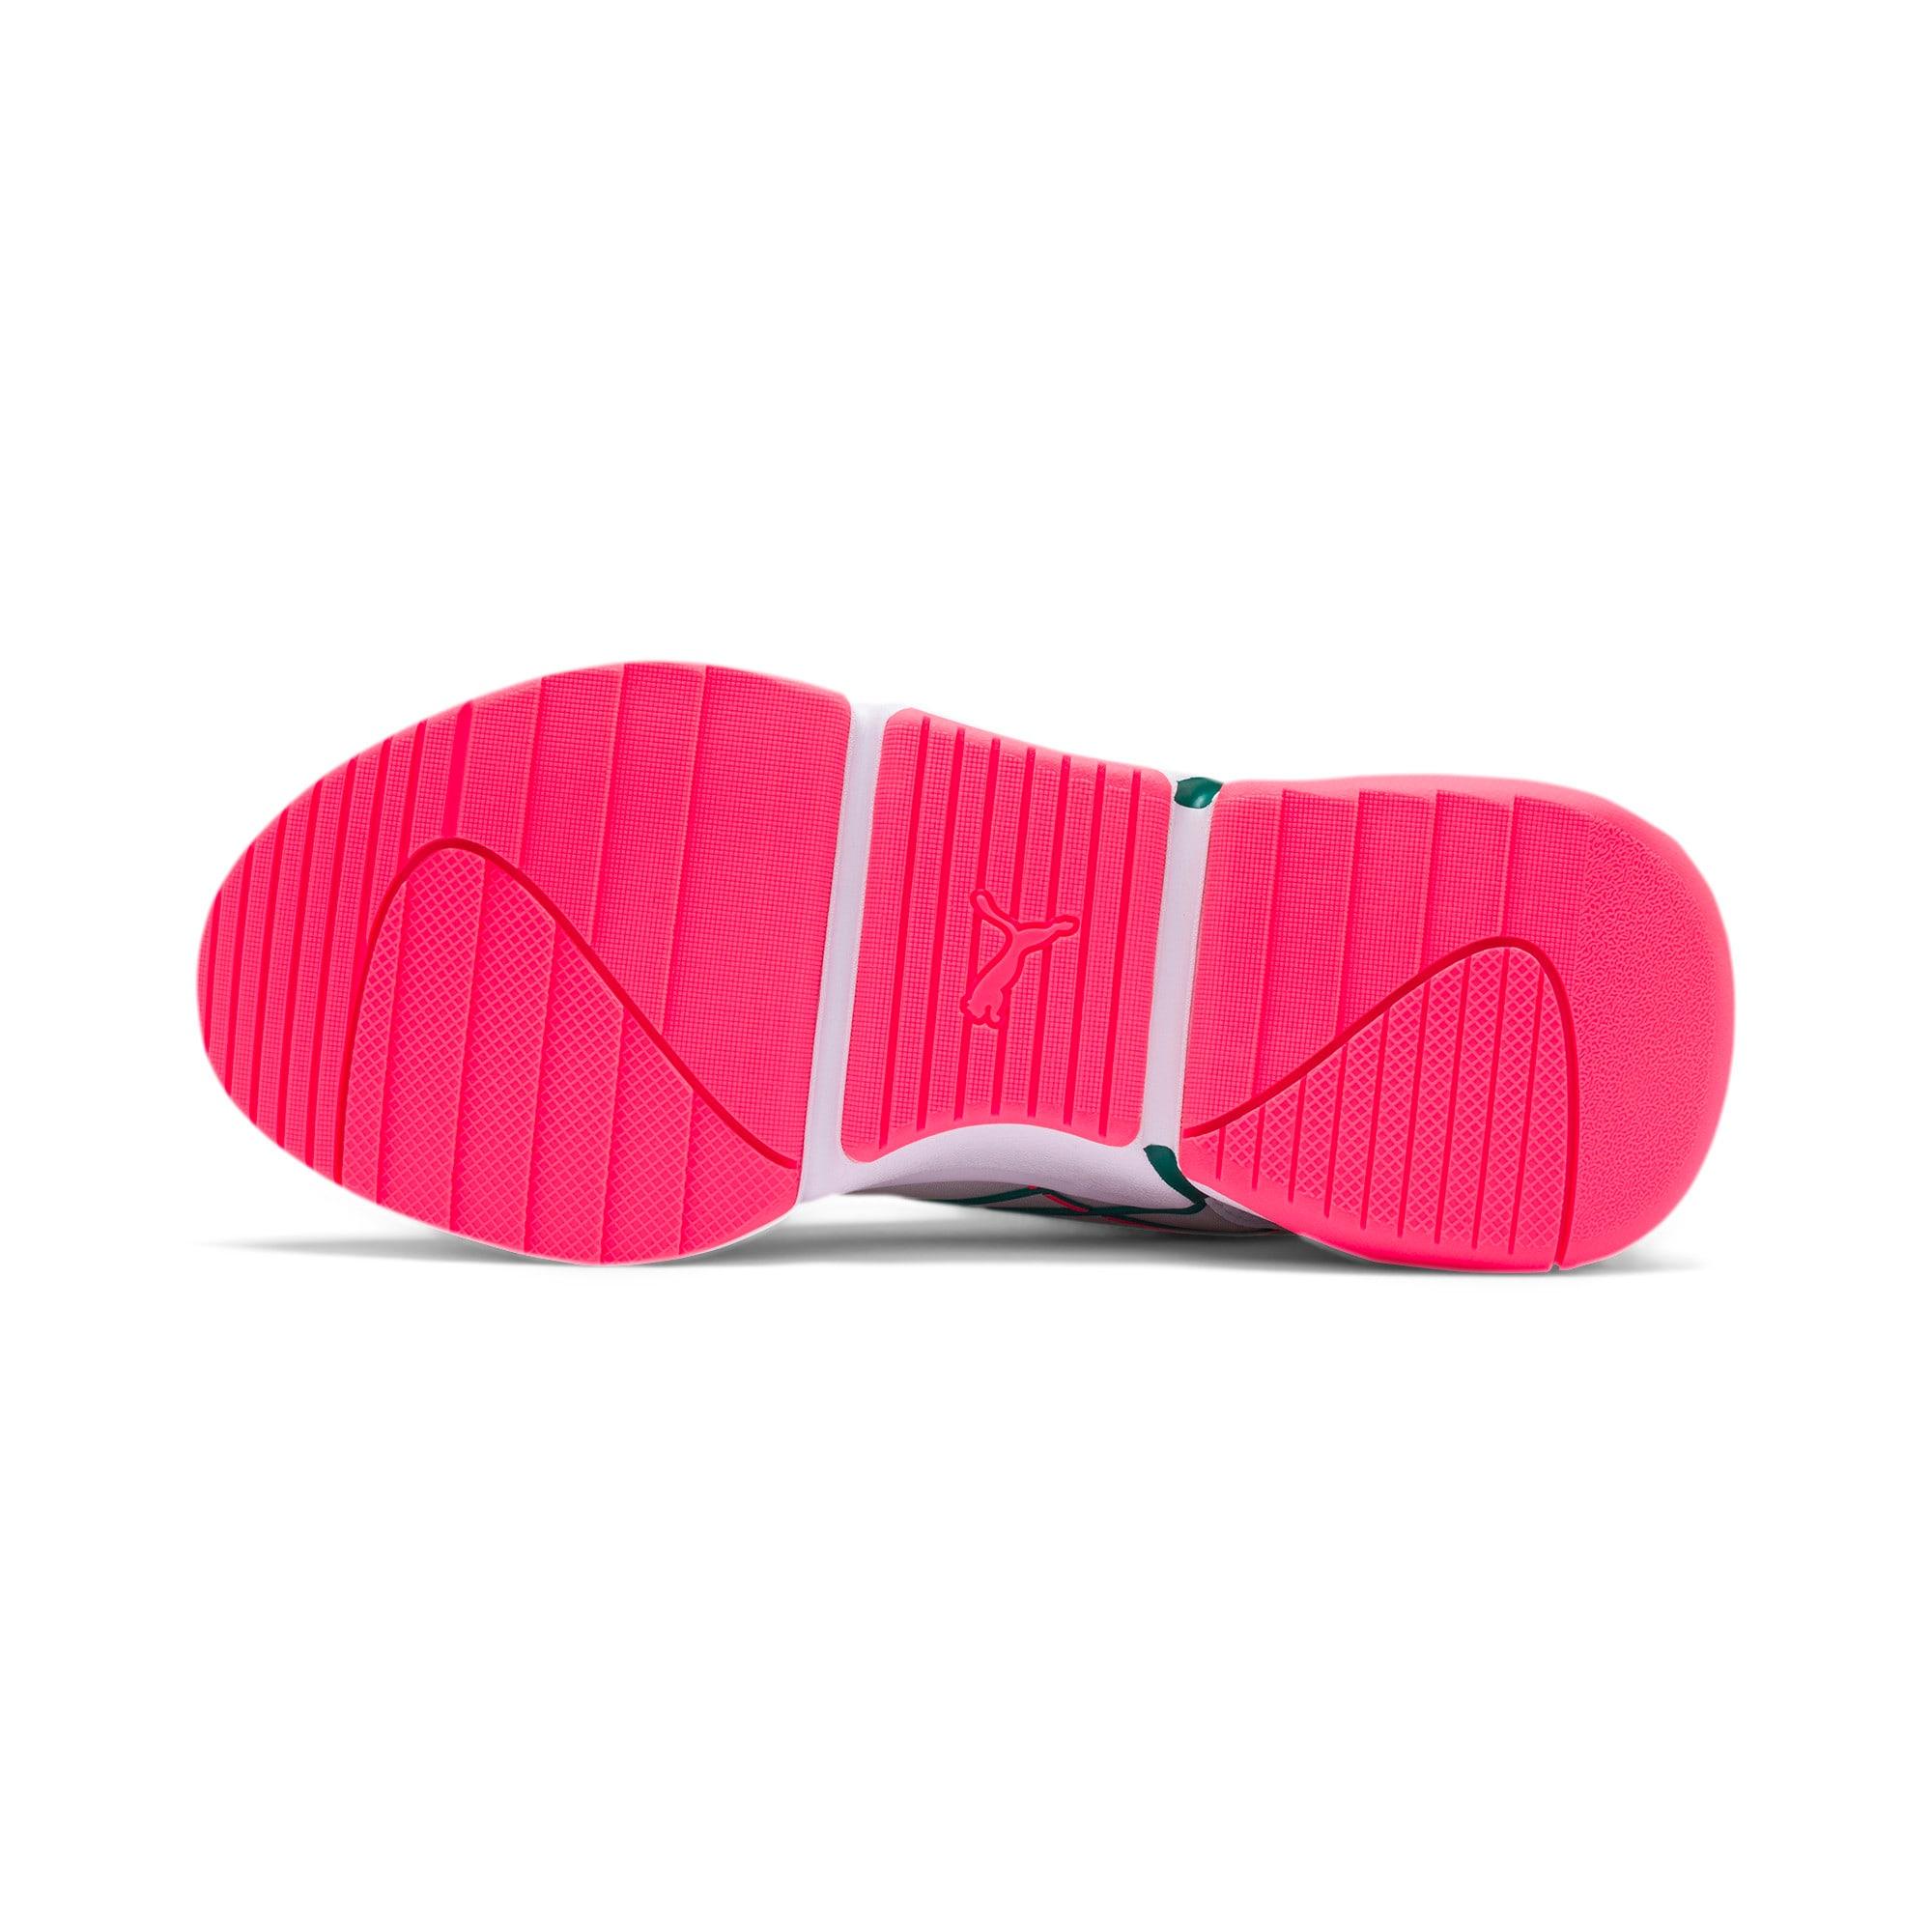 Thumbnail 5 of Nova Hypertech Women's Sneakers, Puma White, medium